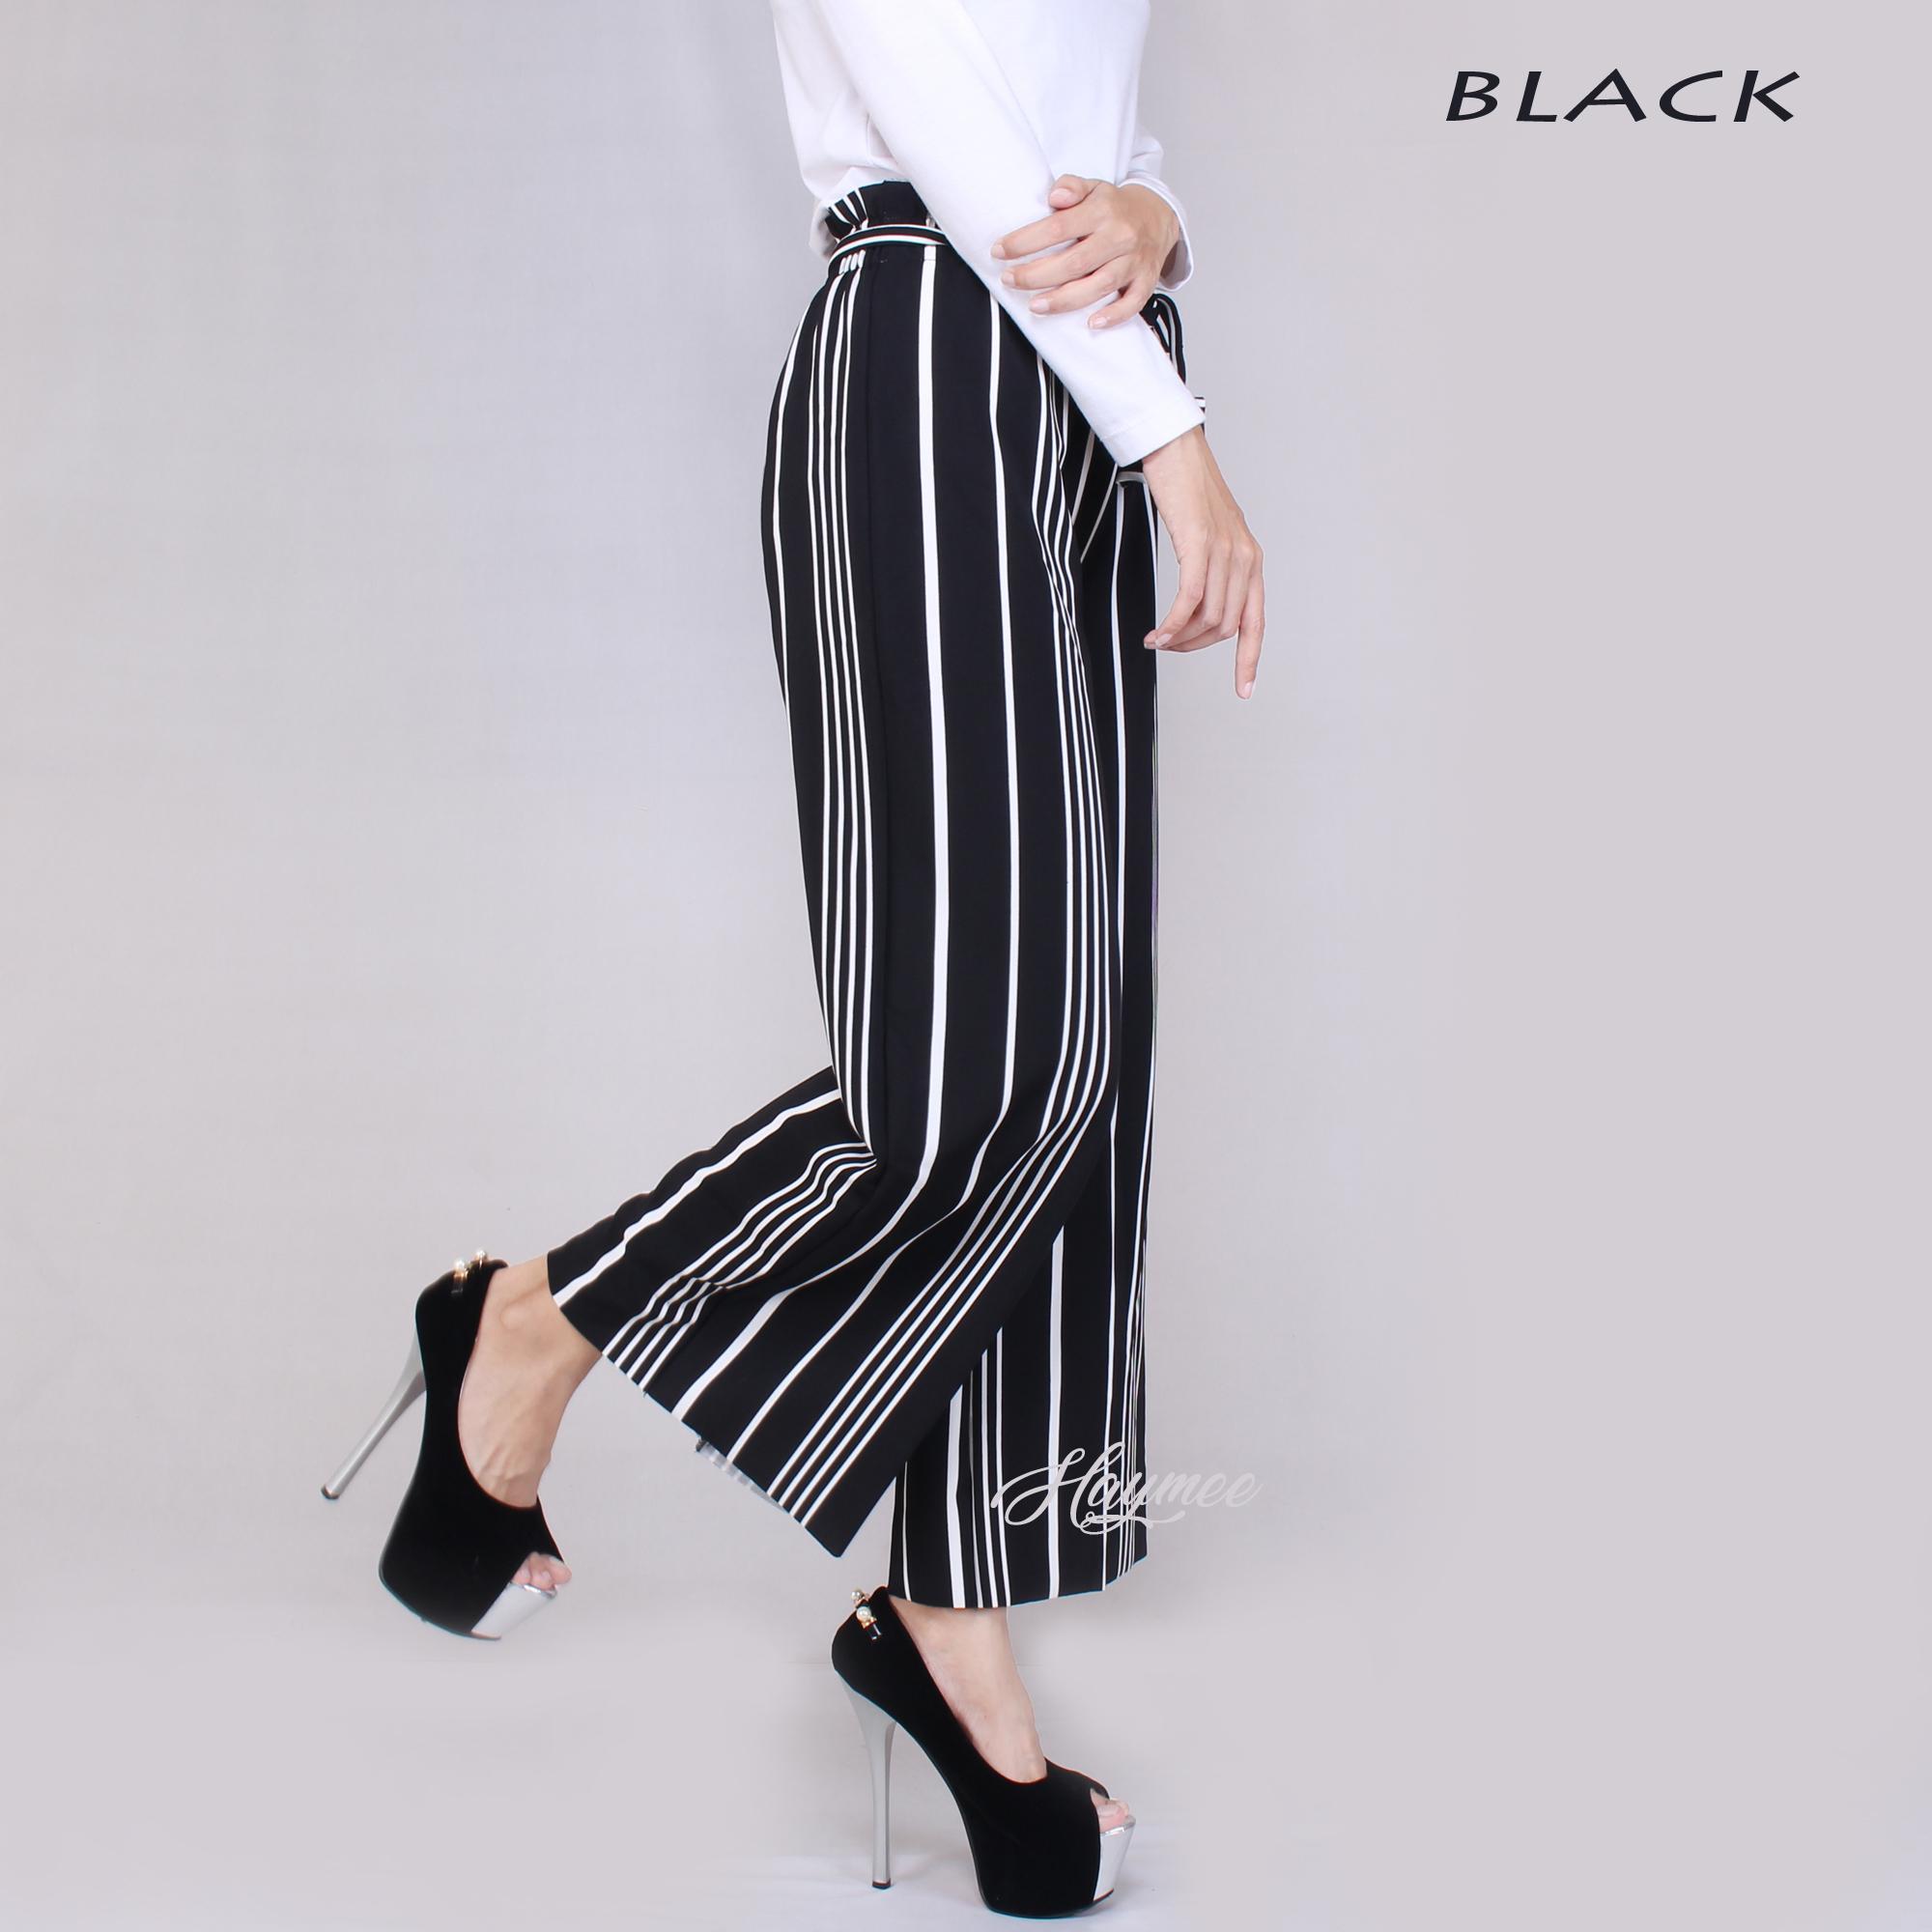 Ace Fashion Axel Cullote Pants Celana Kulot Wanita Cream Daftar Midi Nda Fjn822b Inc 5978 Salur Plisket Pleats Cullot Cewek Pinggang Tali